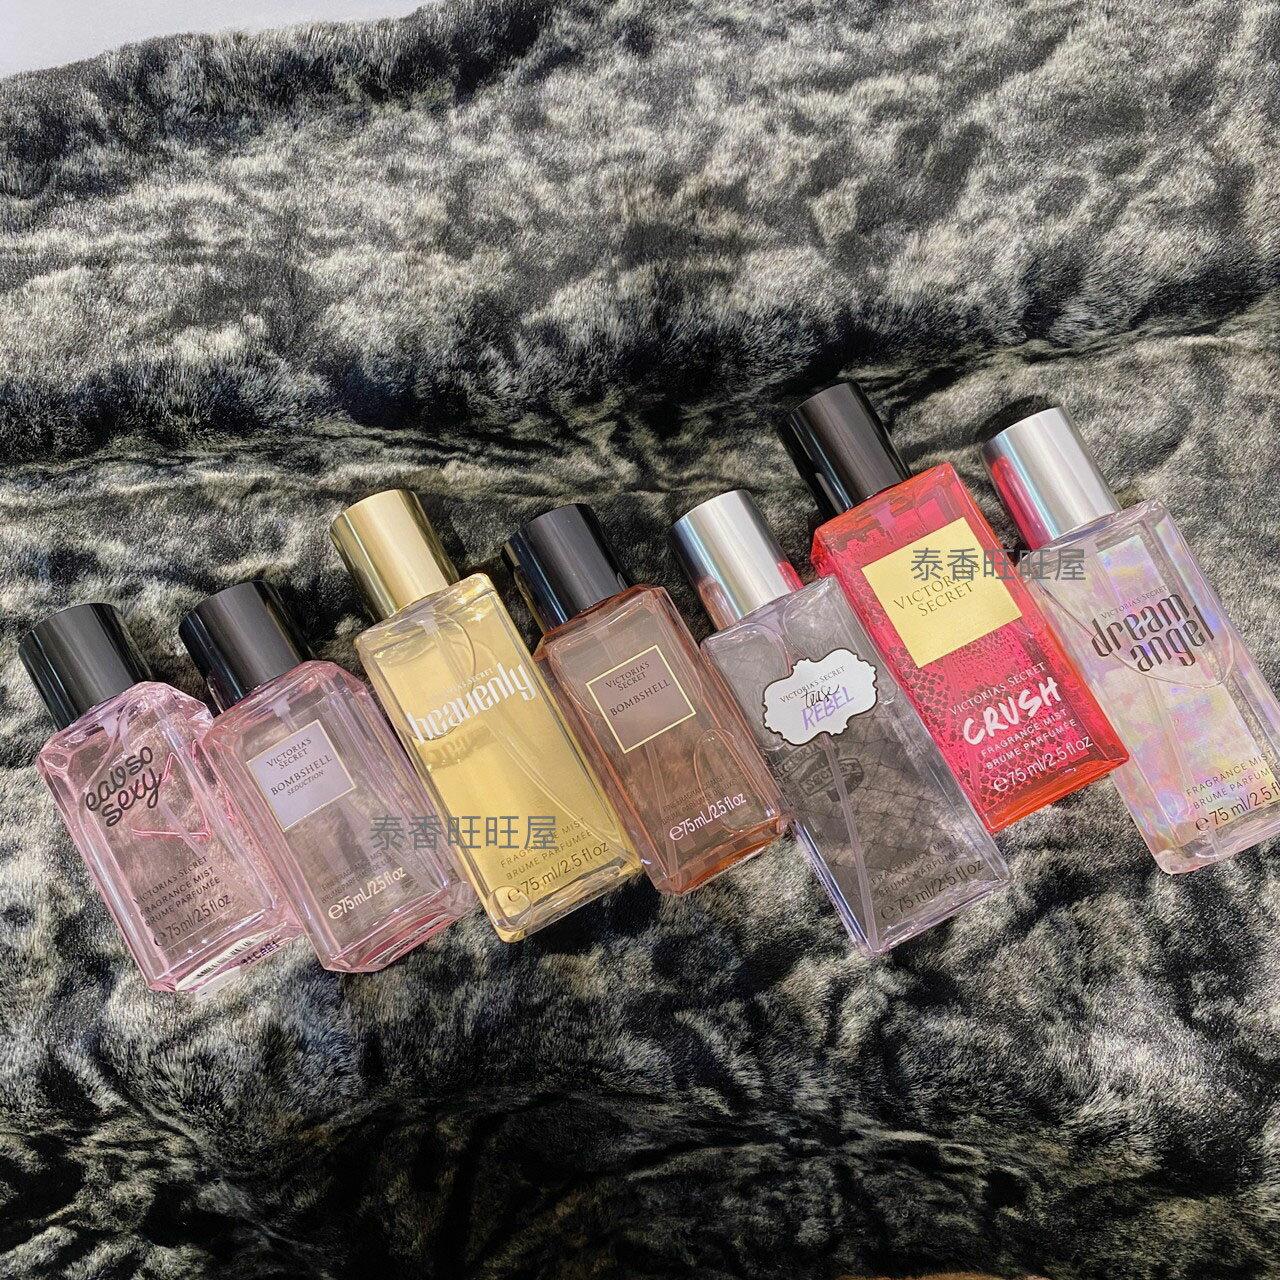 Victoria's Secret 維多利亞的秘密 VS  隨身香氛噴霧75ml / 滾珠7ml 香氛噴霧 香水 隨身瓶 滾珠瓶 新品到 BEACH